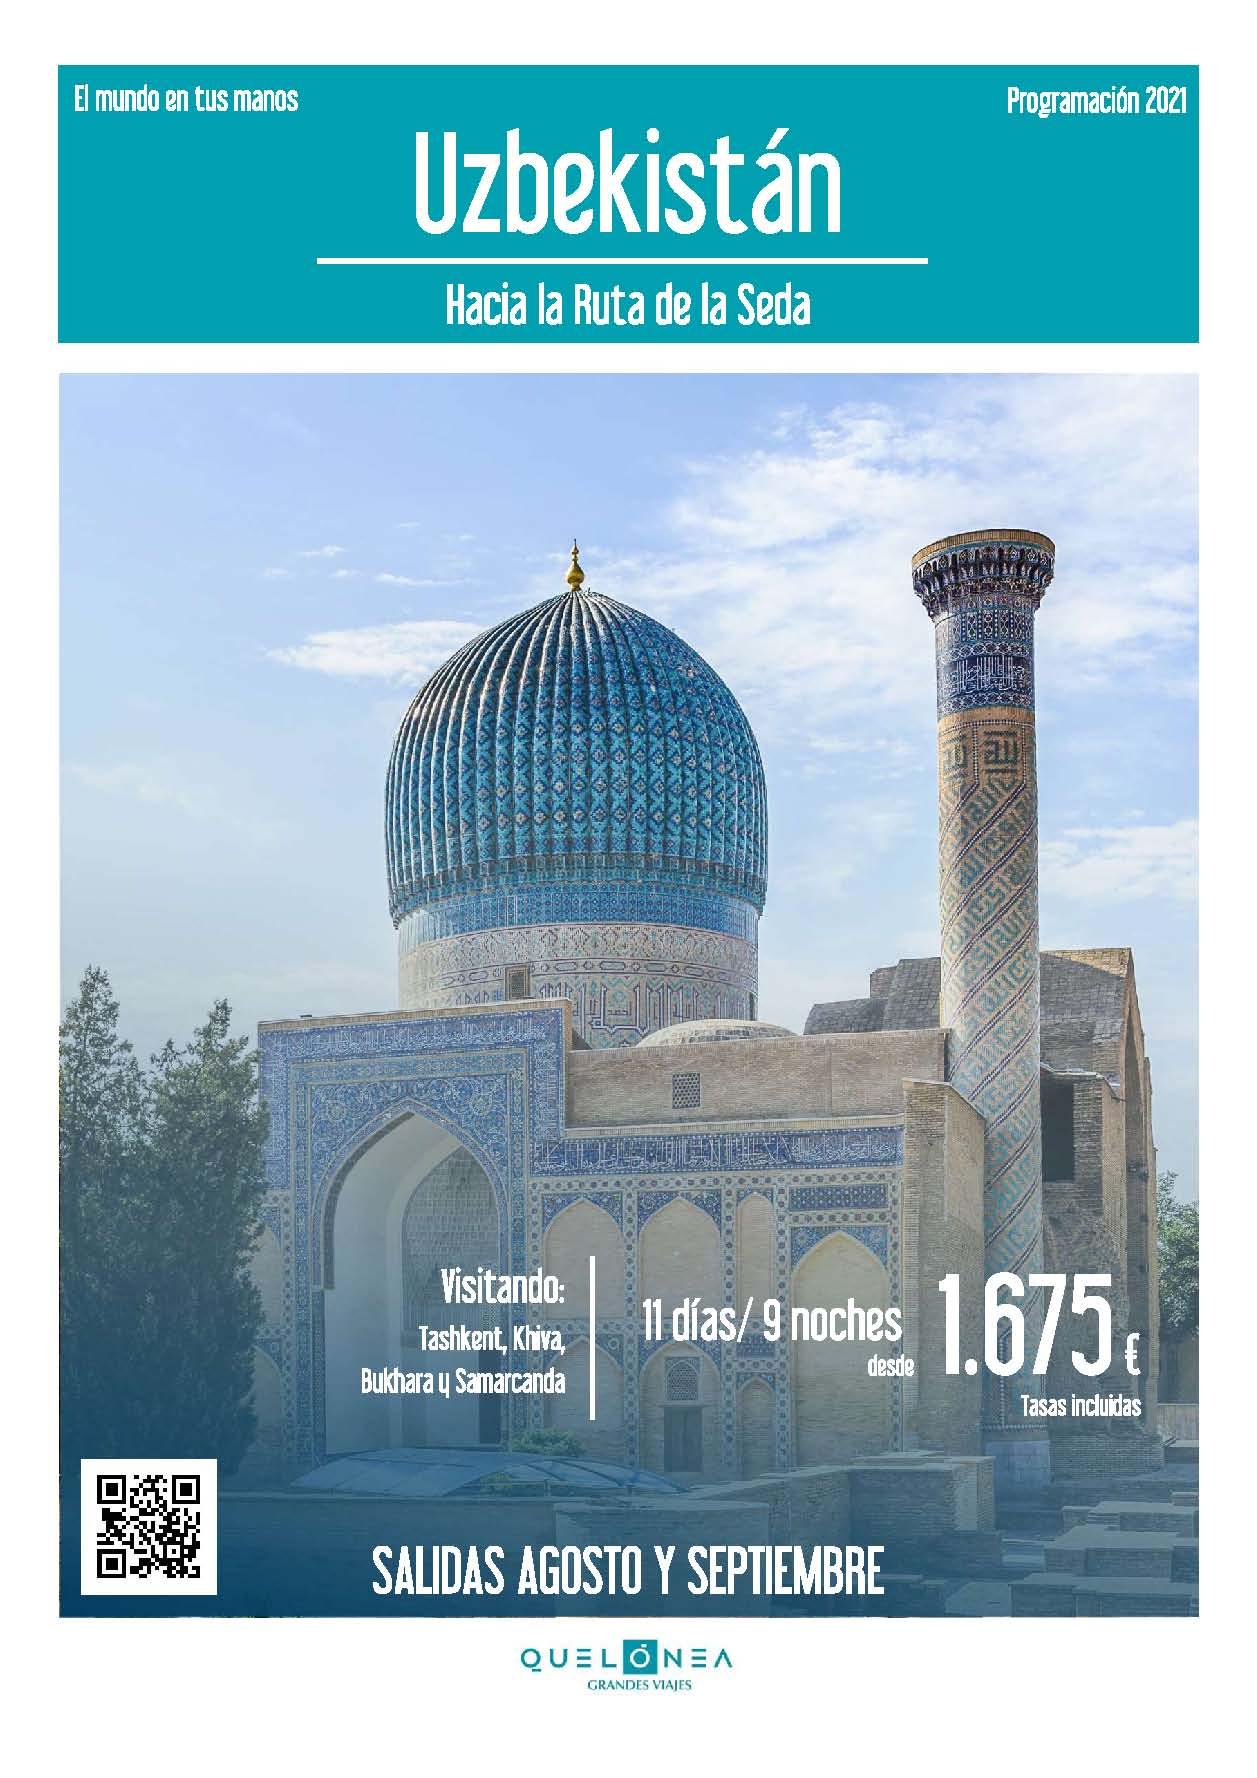 Ofertas Quelonea Uzbekistan Verano 2021salidas desde Madrid